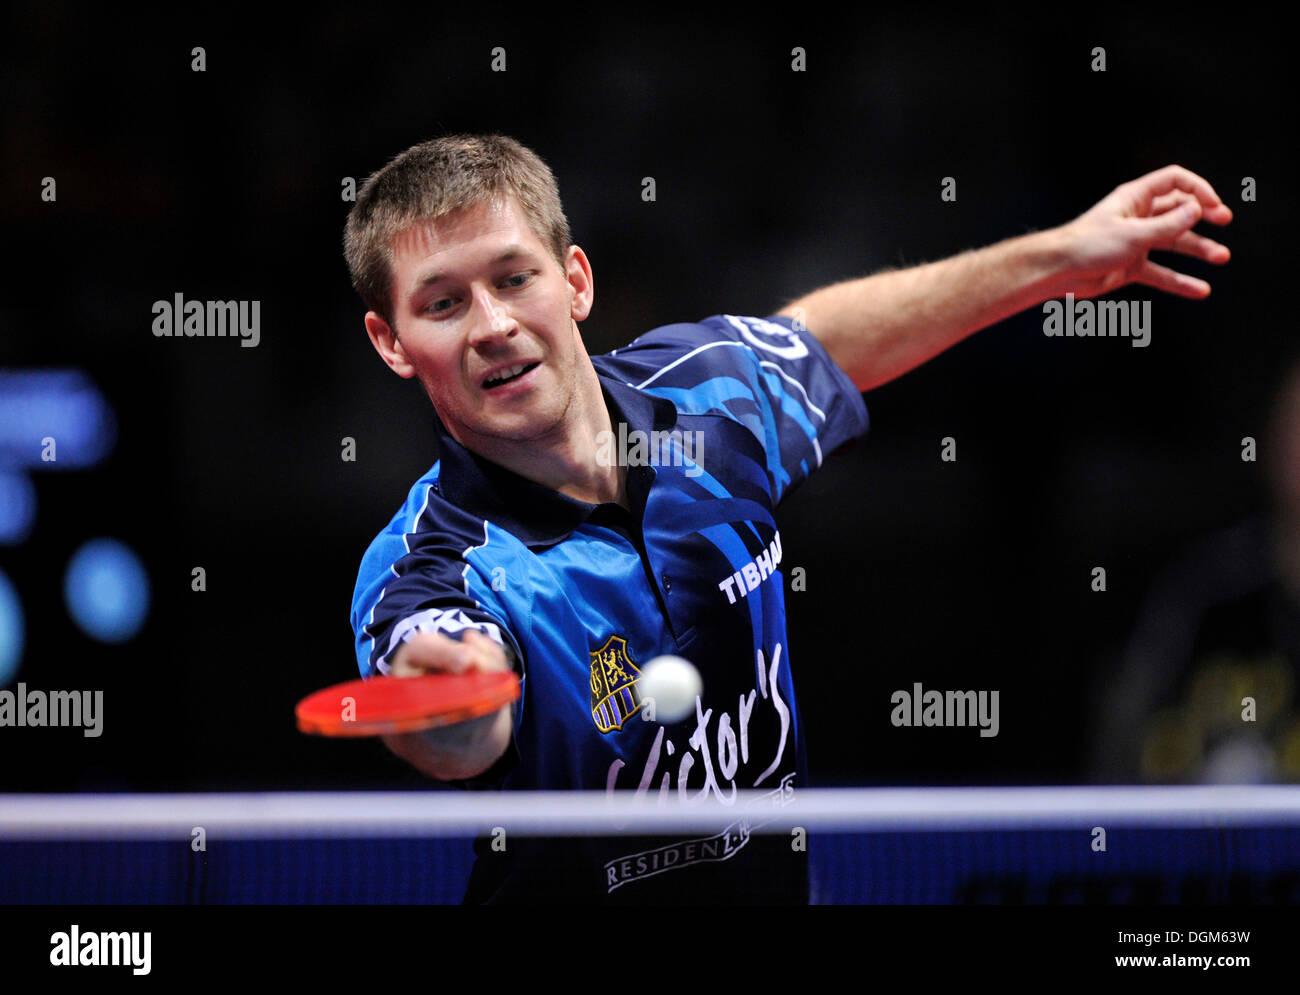 Bastian Steger, table tennis cup finals, Porsche Arena, Stuttgart, Baden-Wuerttemberg - Stock Image